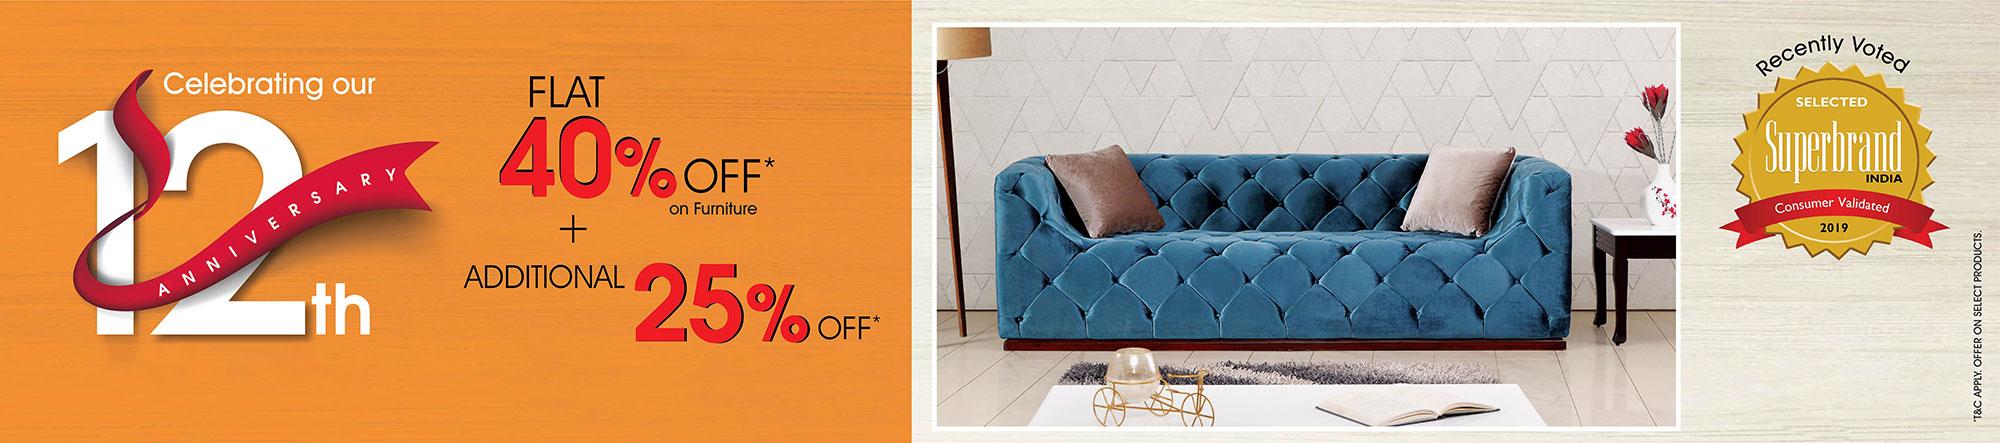 Fantastic Furniture Store Online Buy Wooden Furniture Upto 50 Off Machost Co Dining Chair Design Ideas Machostcouk